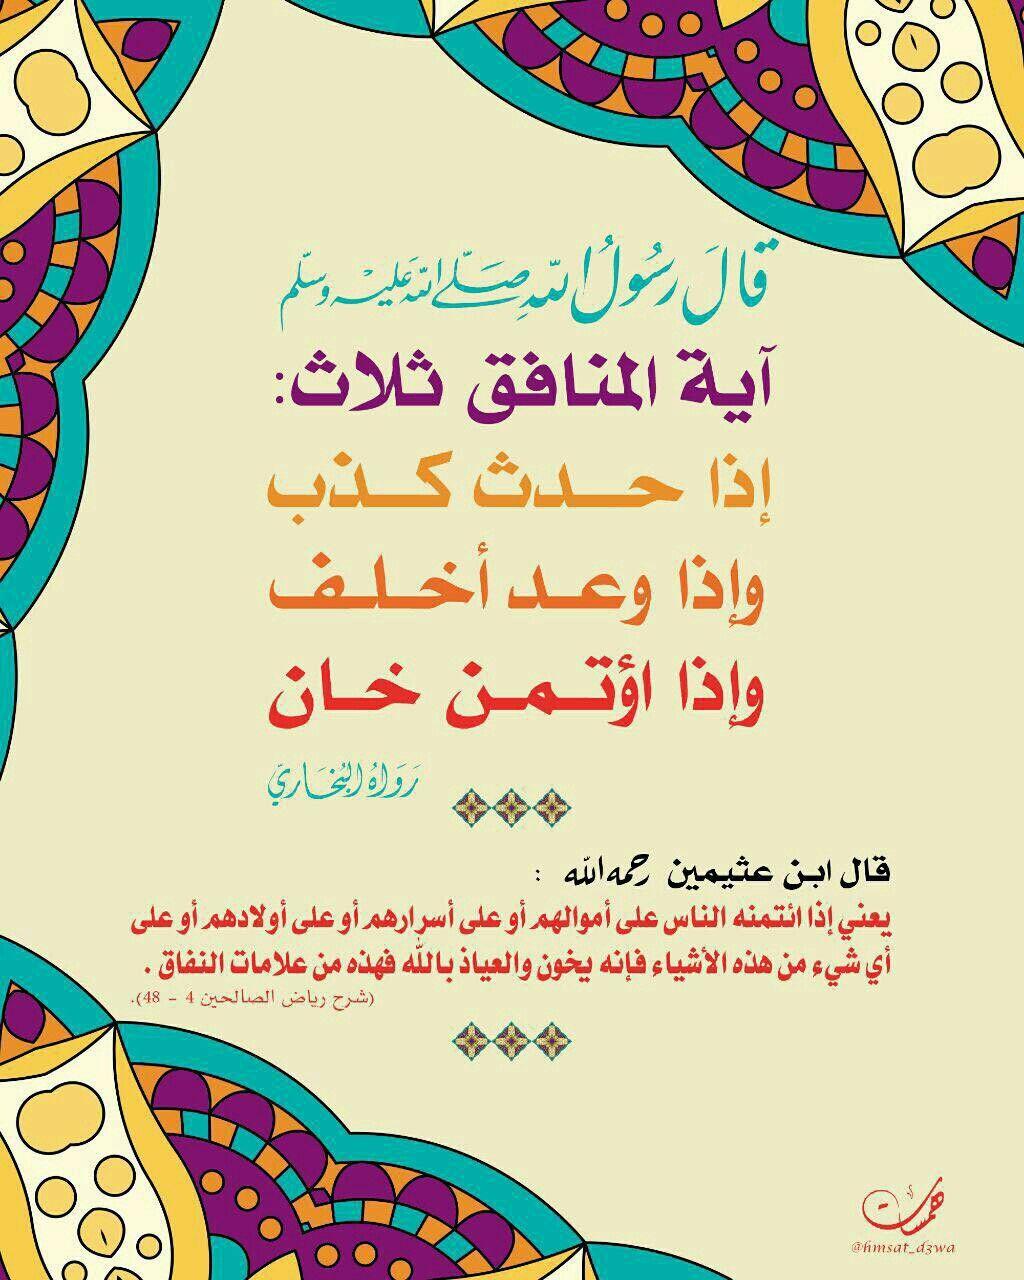 Pin By Mustafa Alfadhl On Holy Quran Calligraphy Arabic Calligraphy Arabic